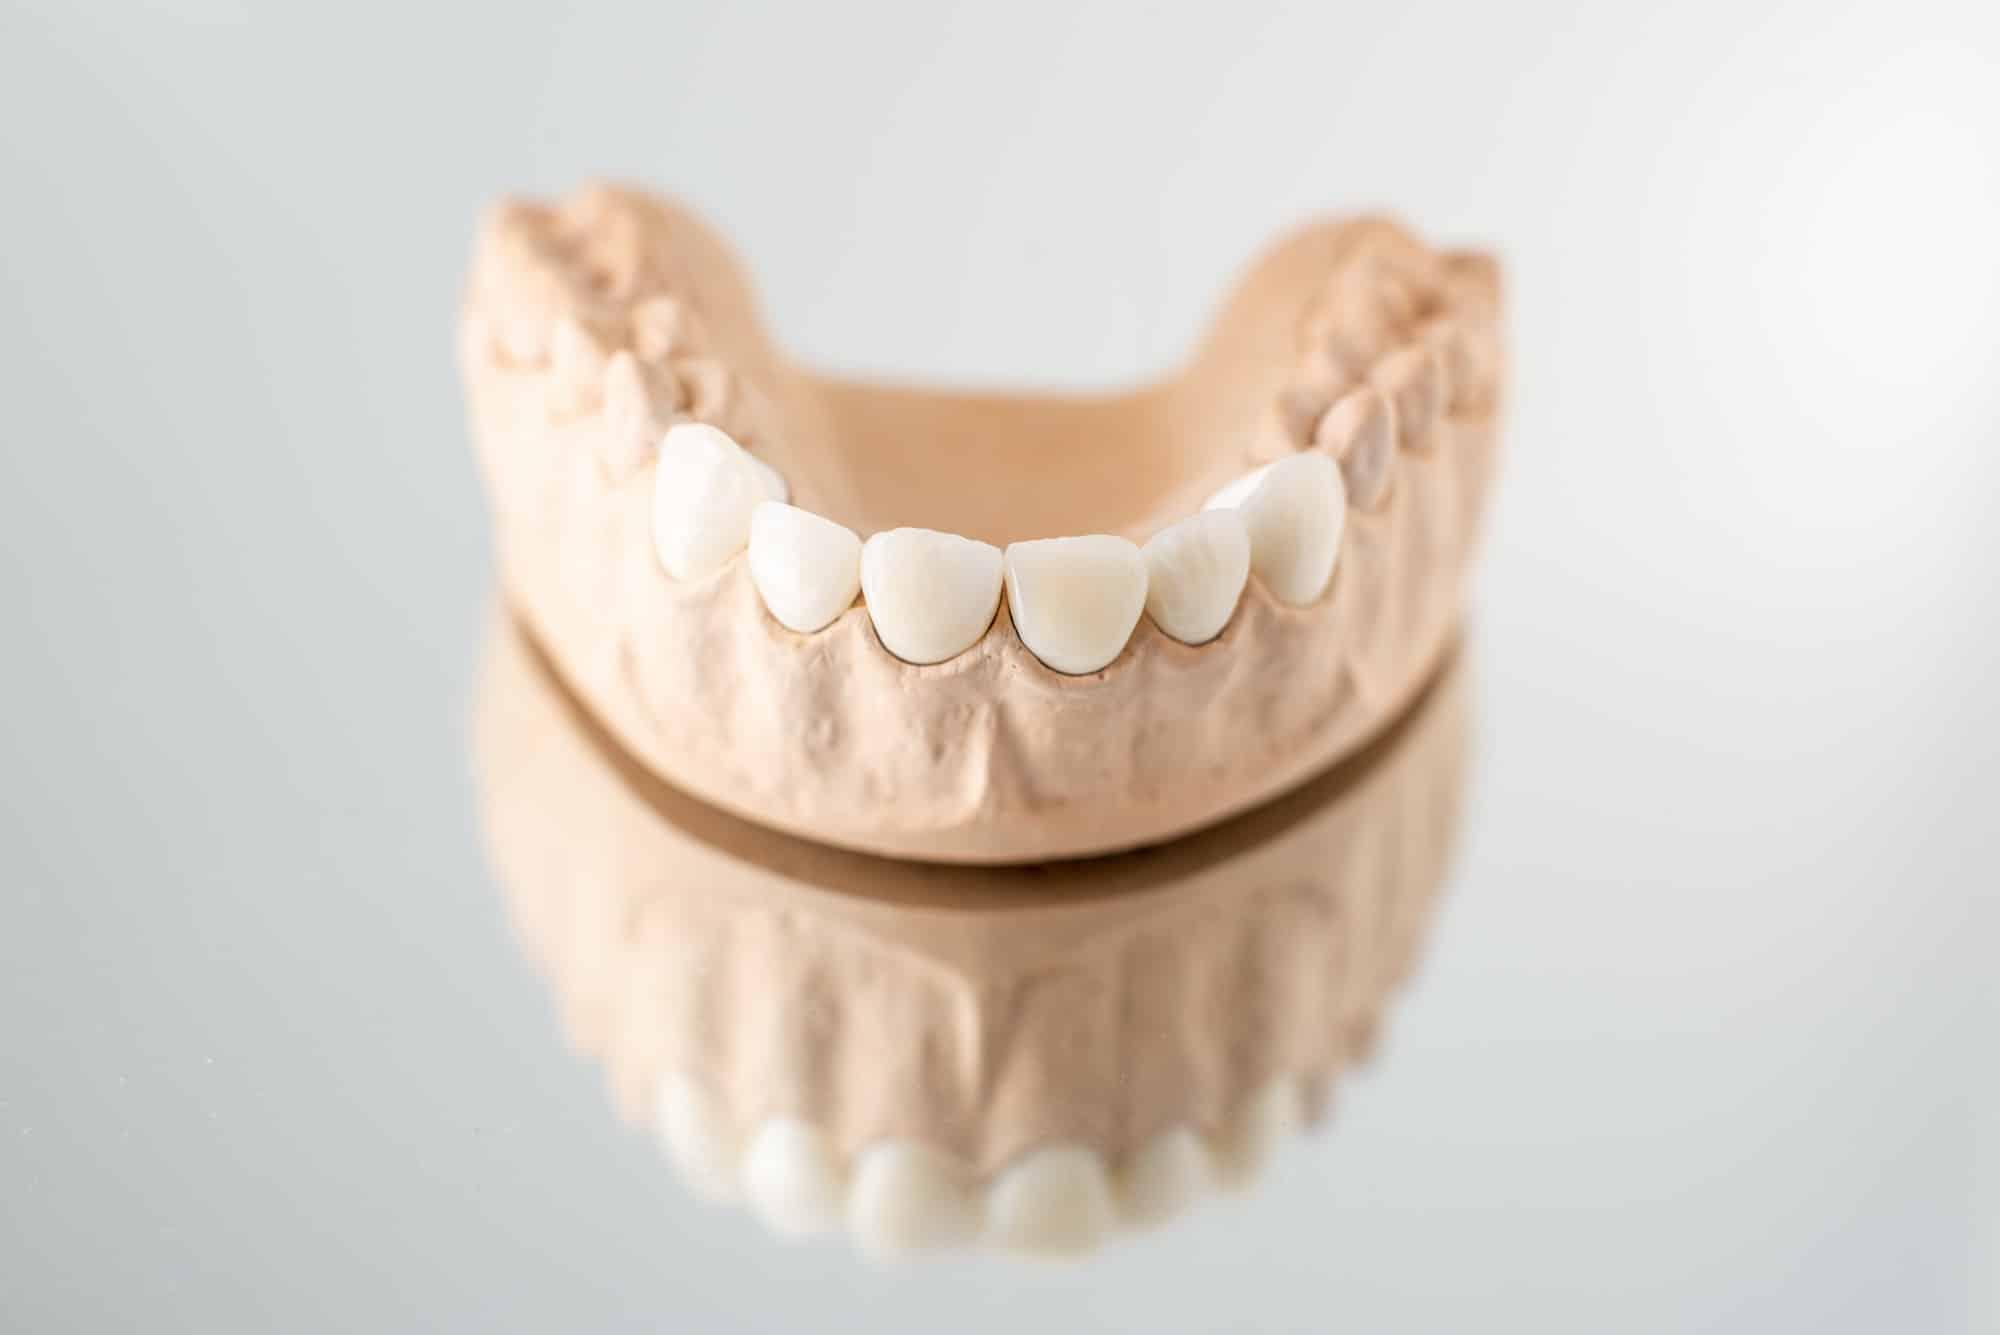 Model of artificial jaw with veneers